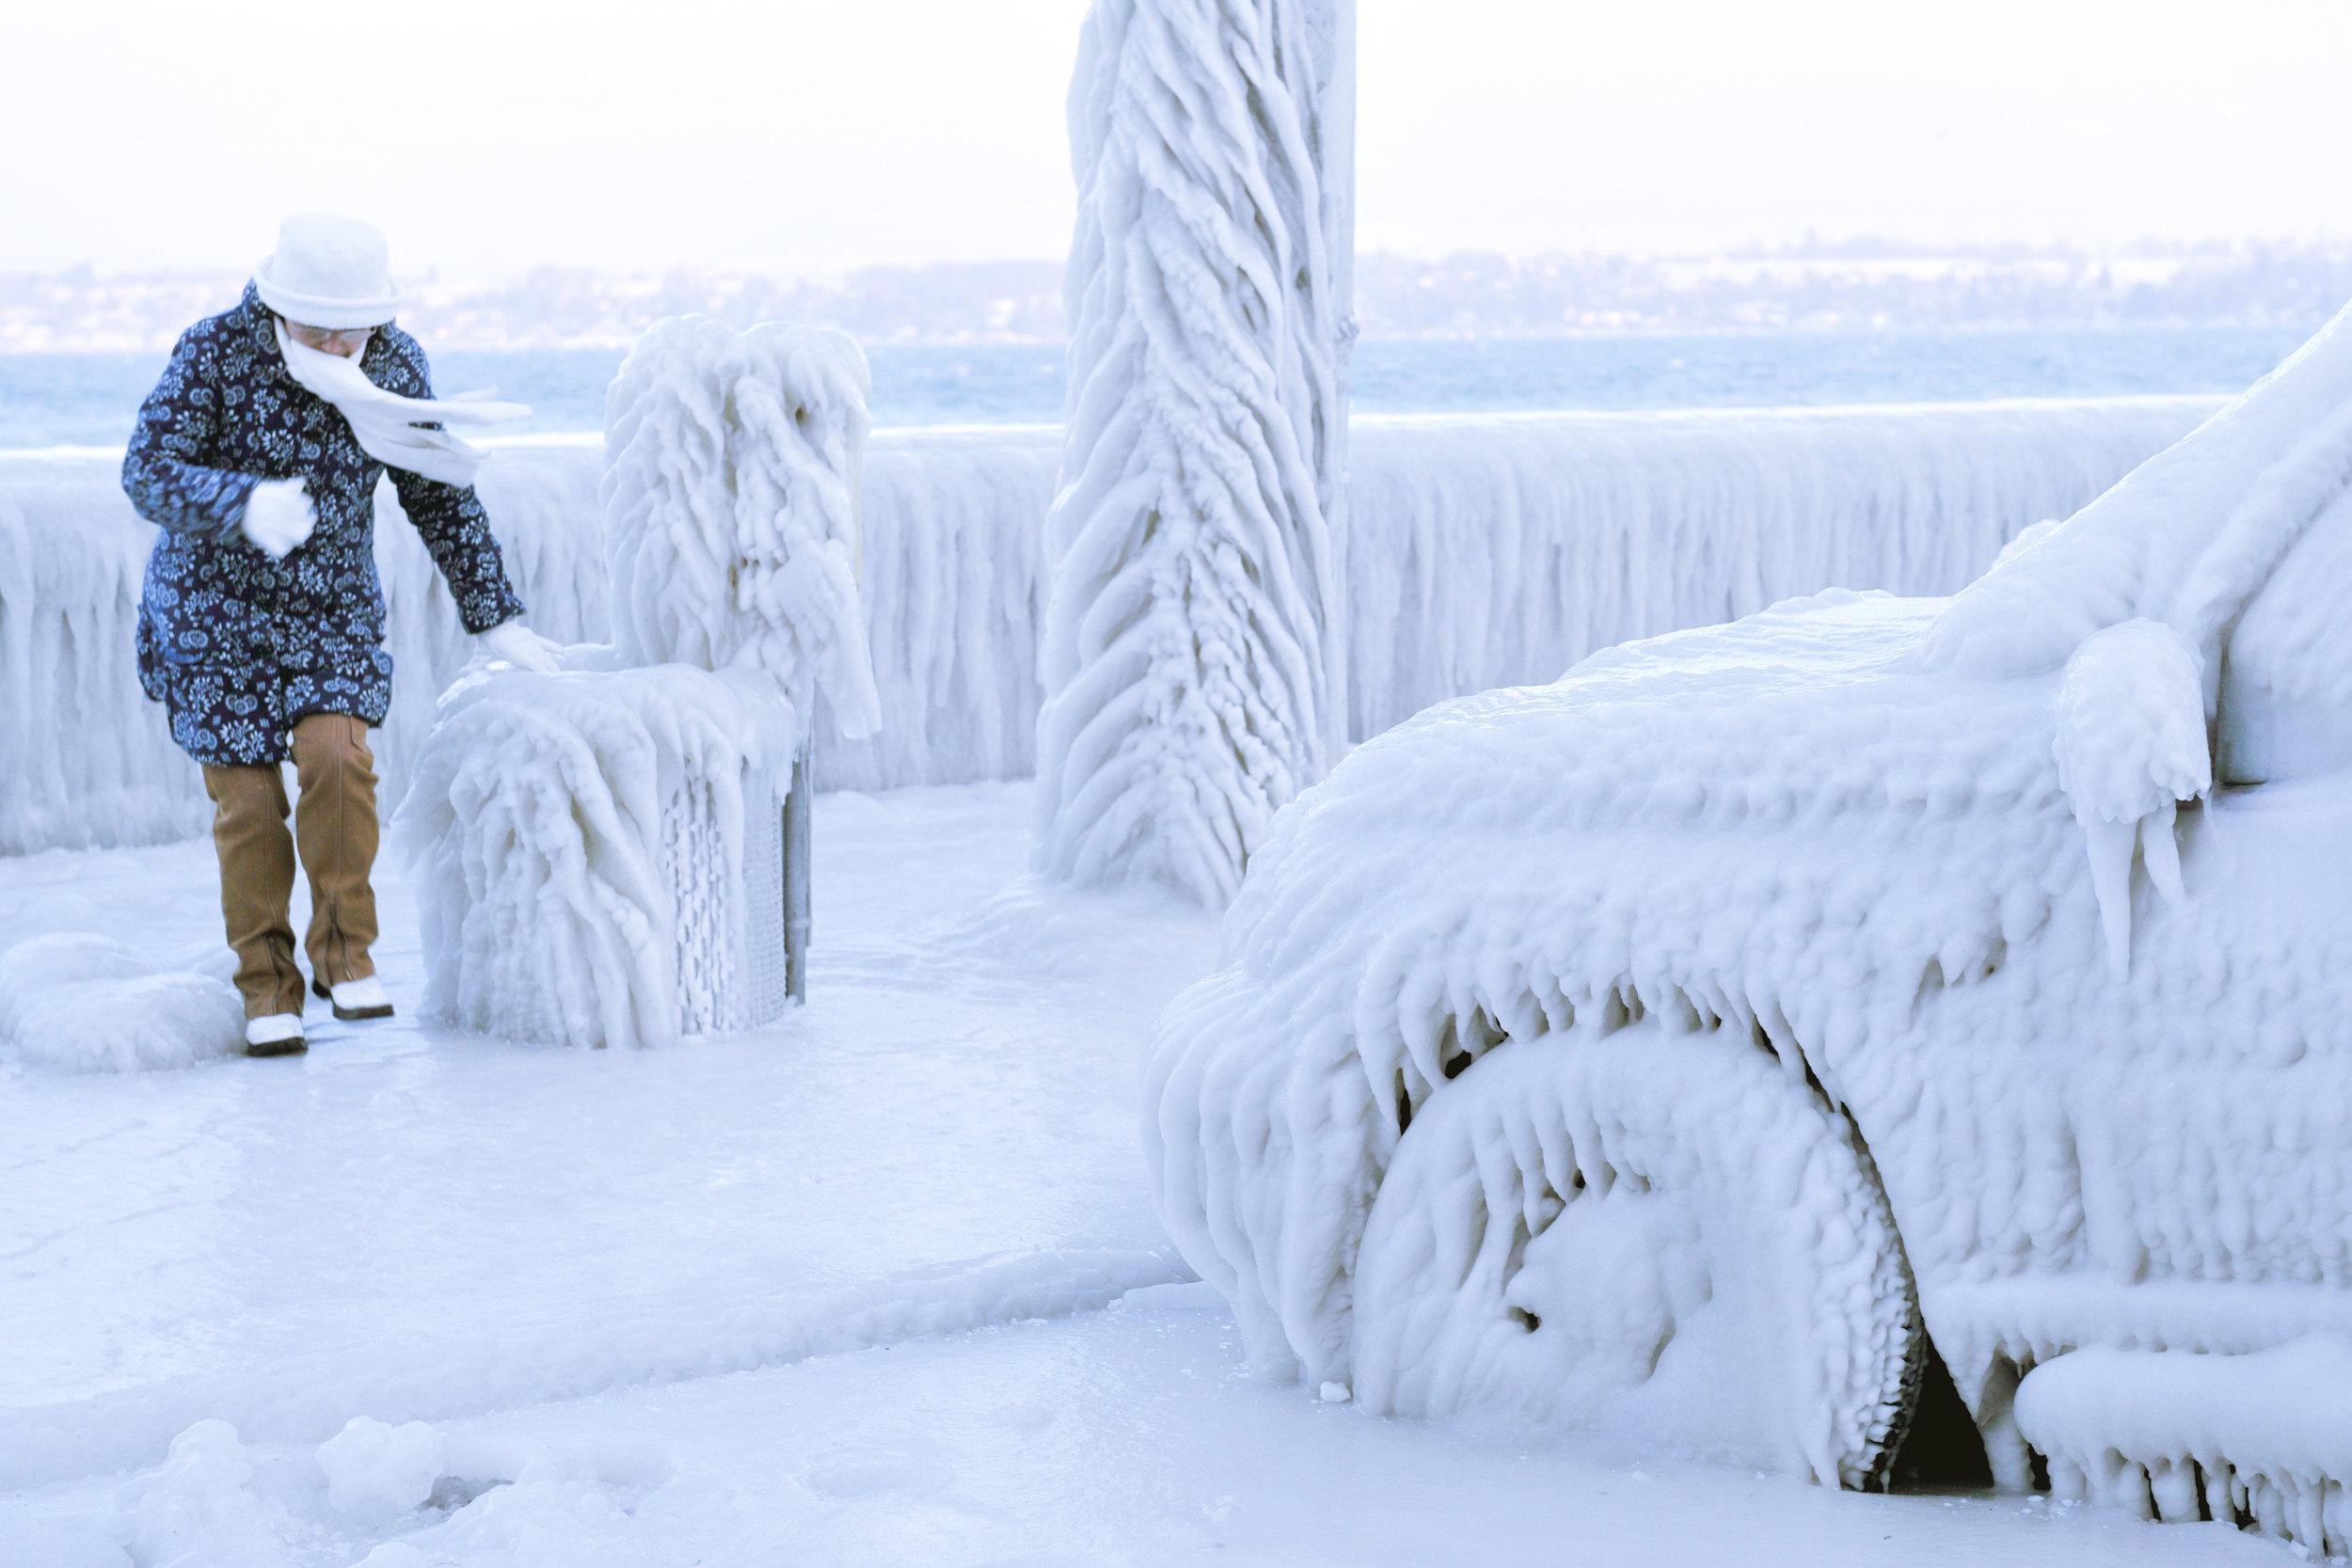 Ice_storm_switzerland-2.jpg